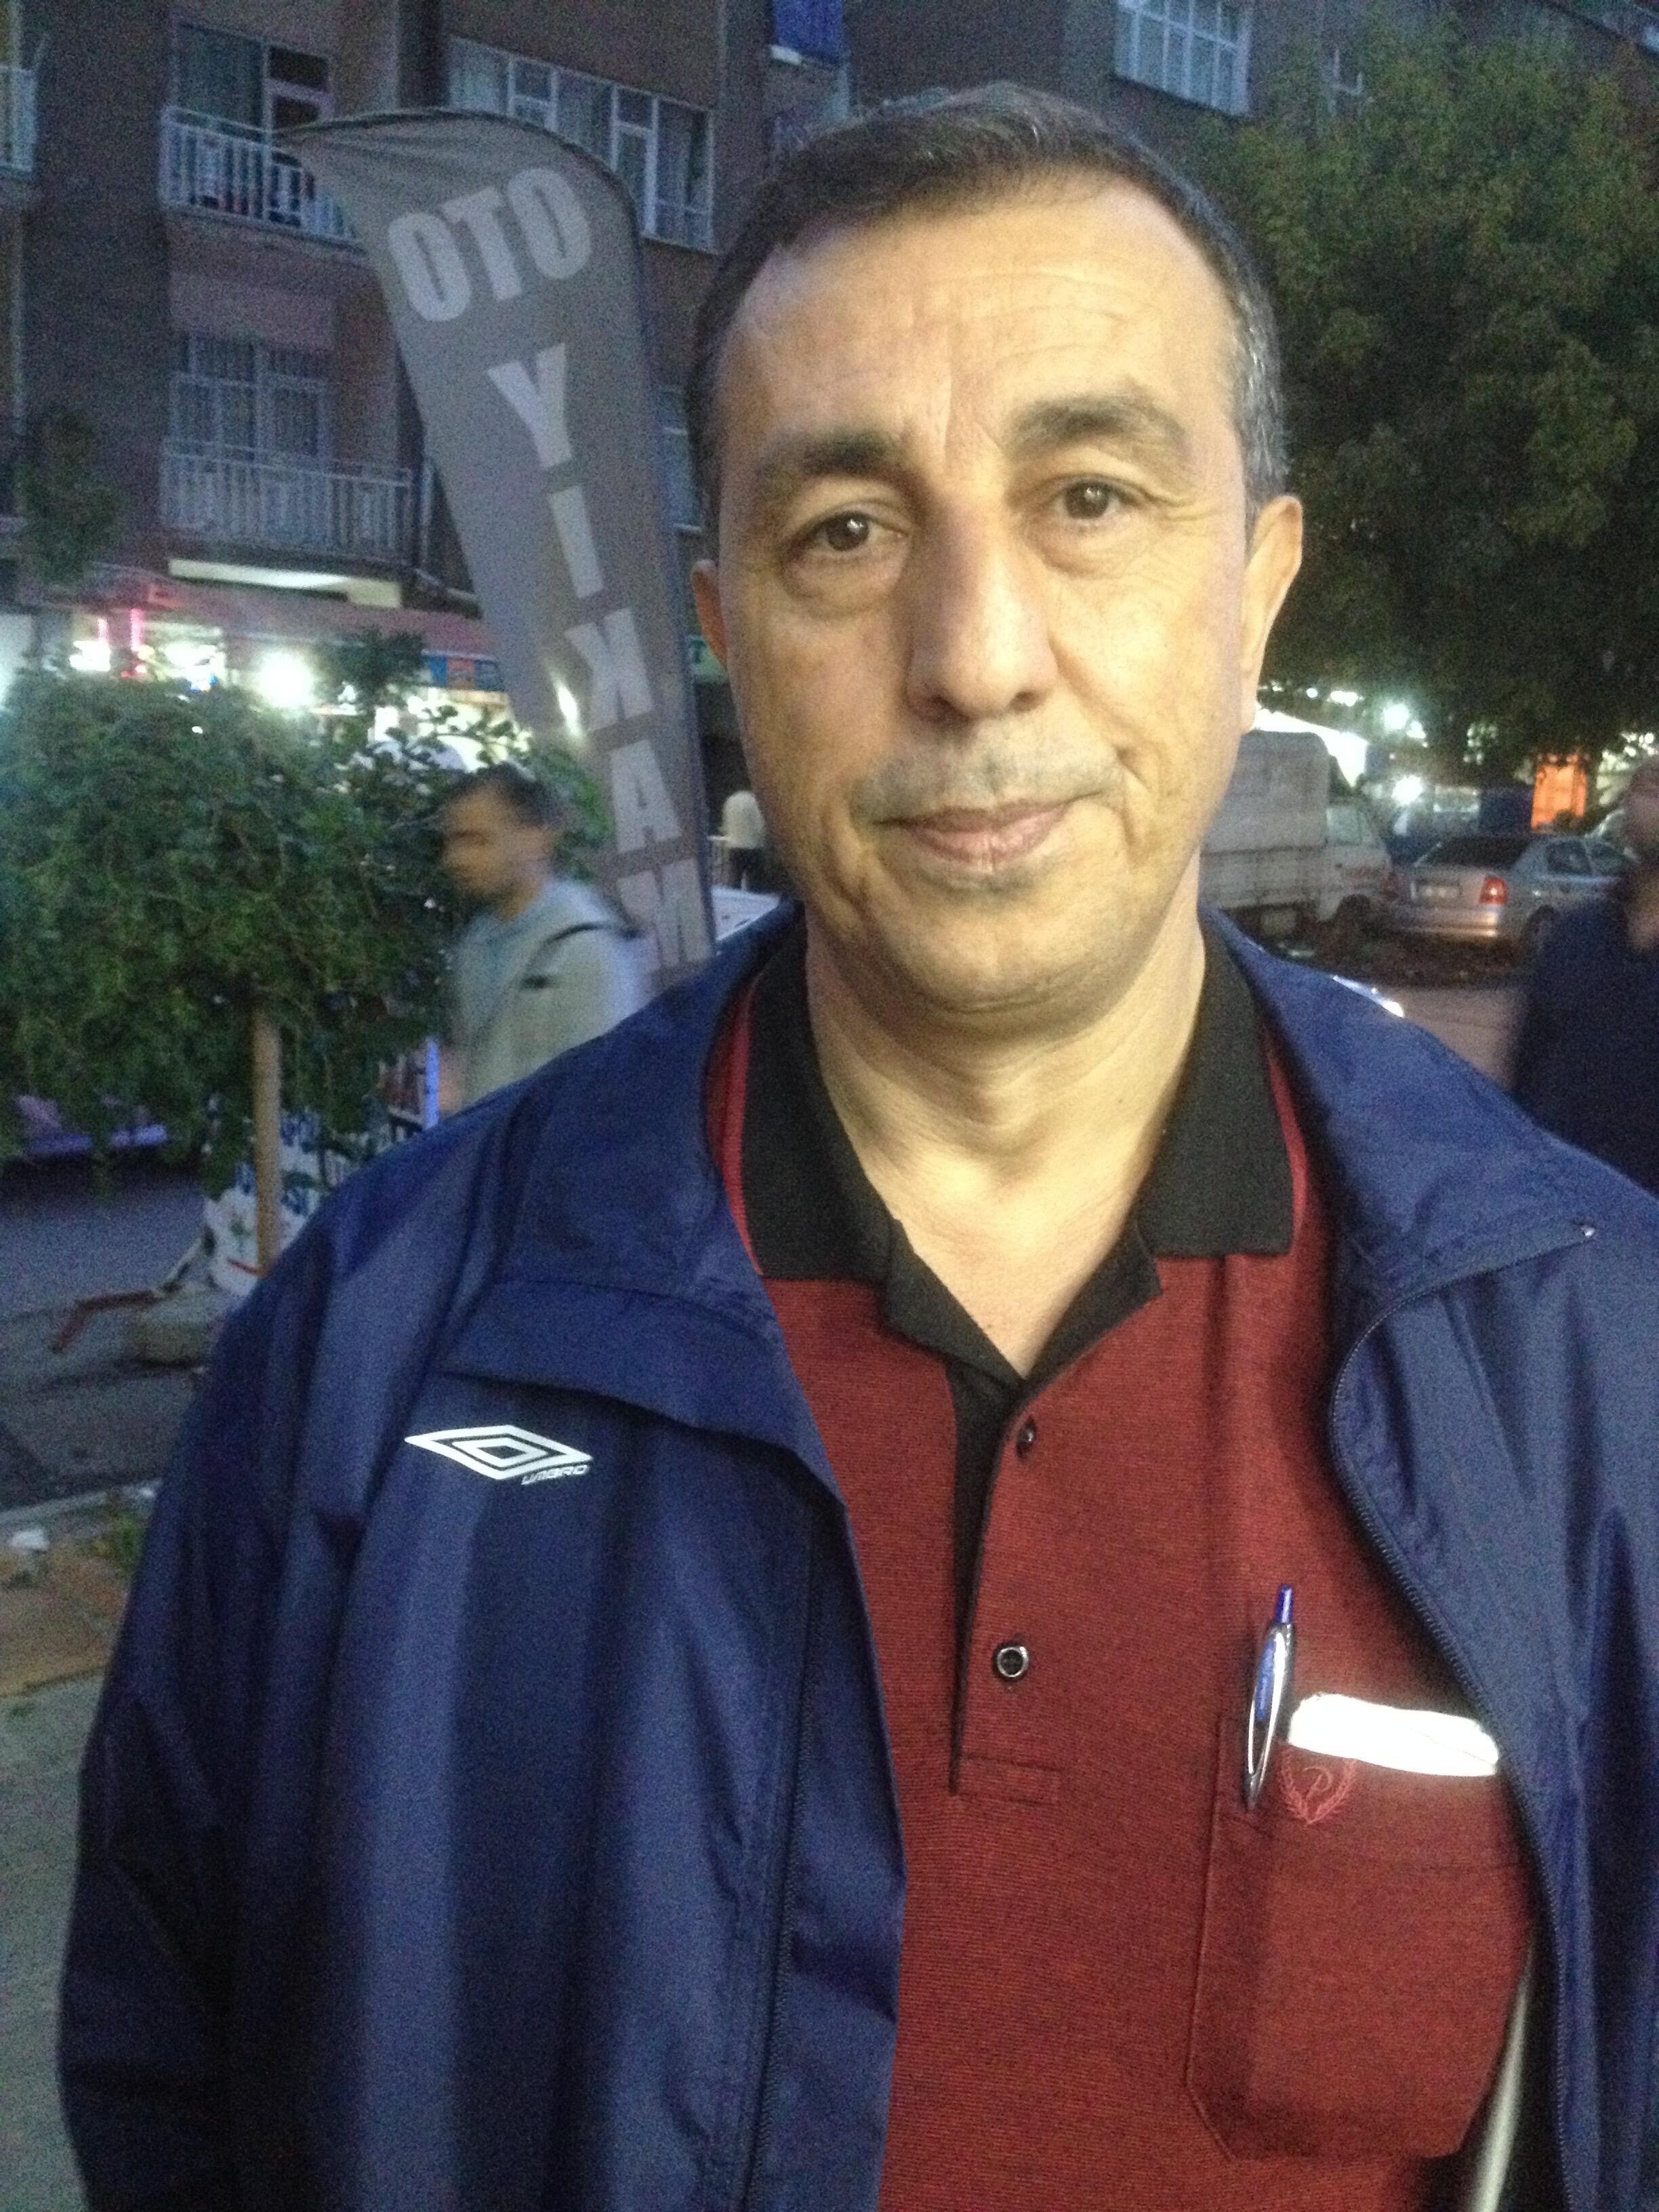 Abdullah Demirbash, a leading HDP supporter in Diyarbakir, Turkey.